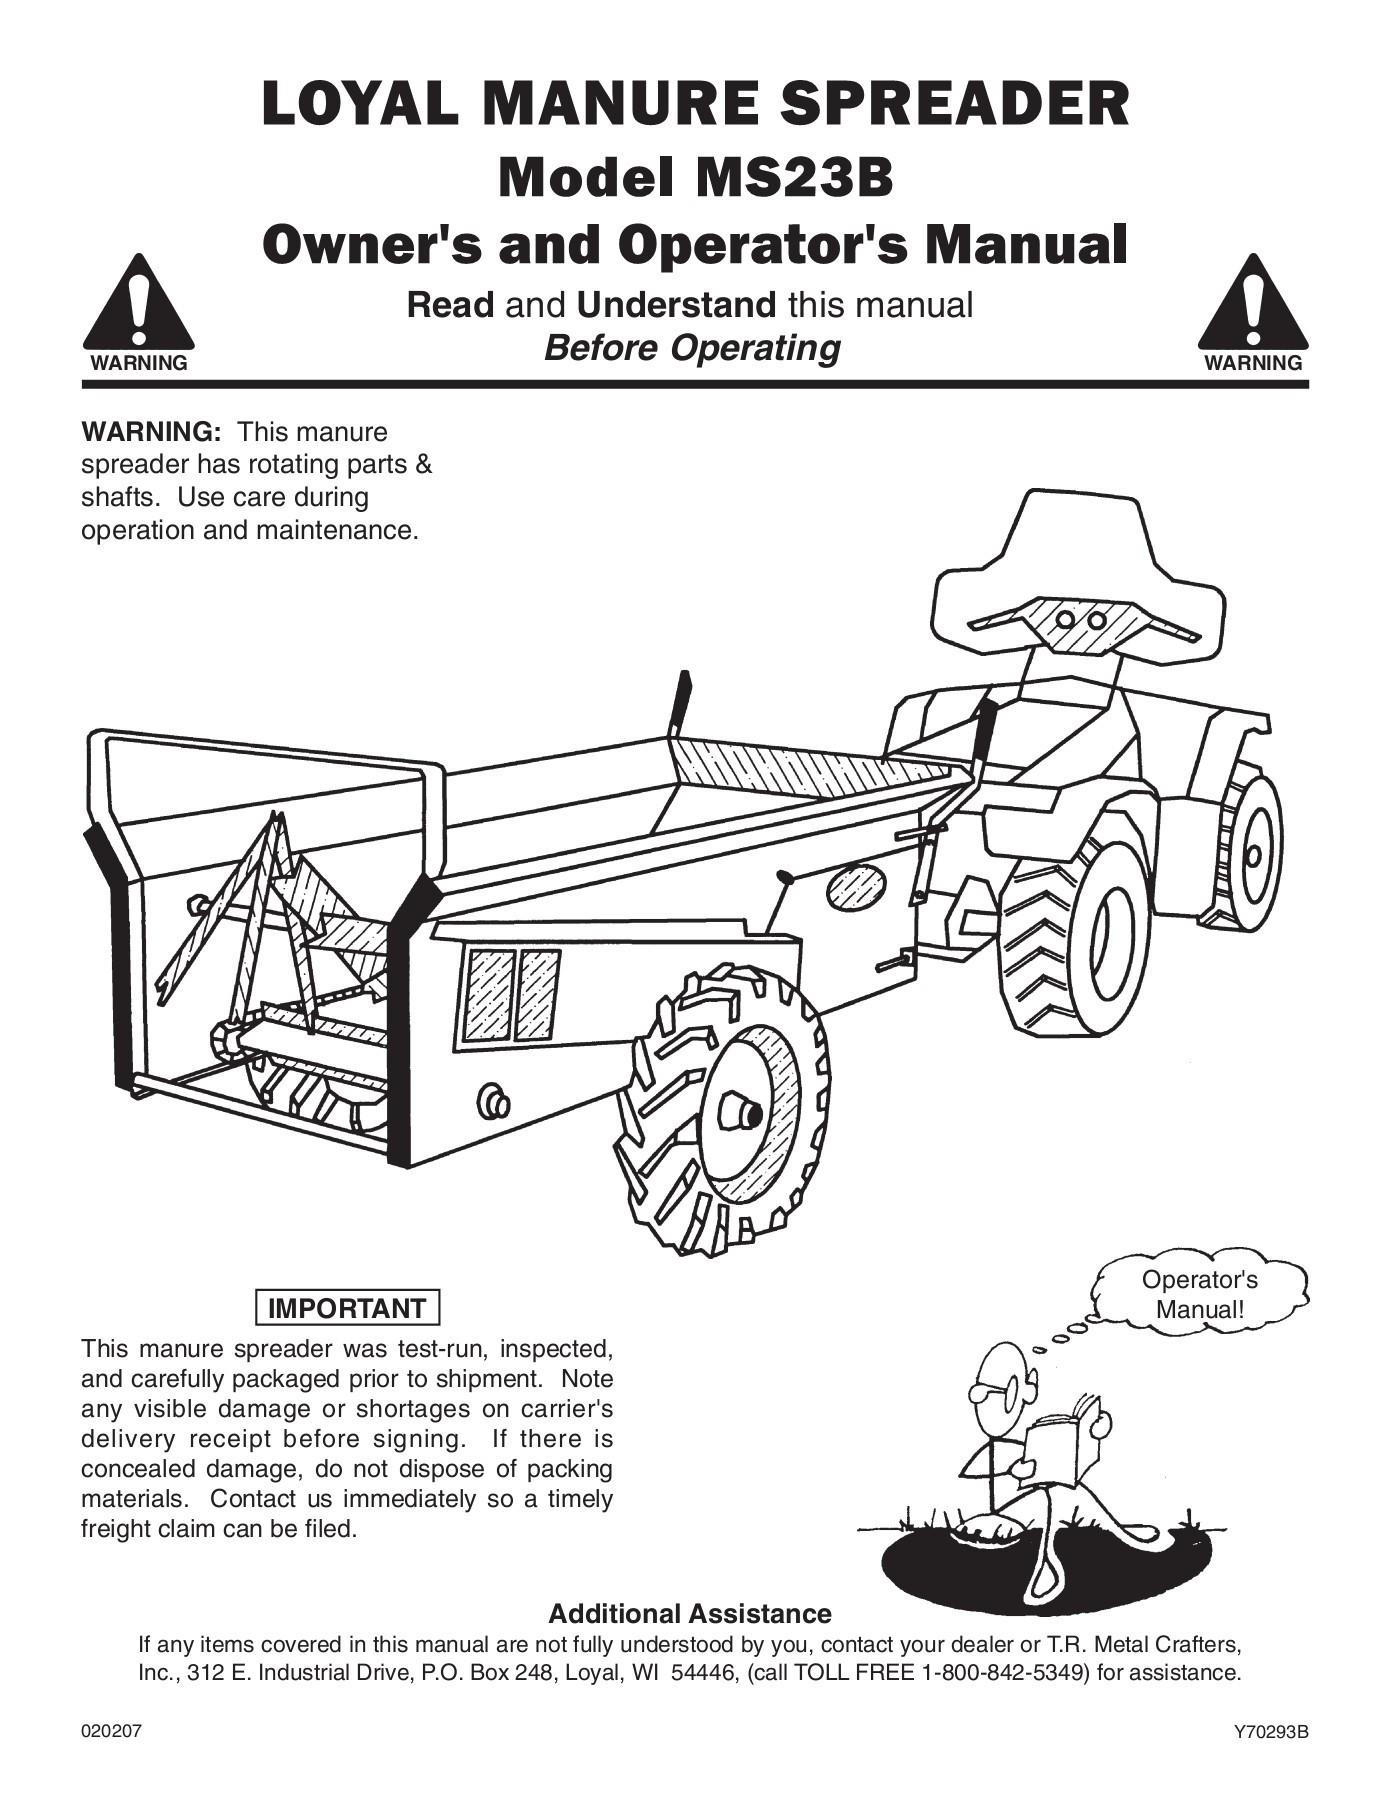 Rotate Tires Diagram